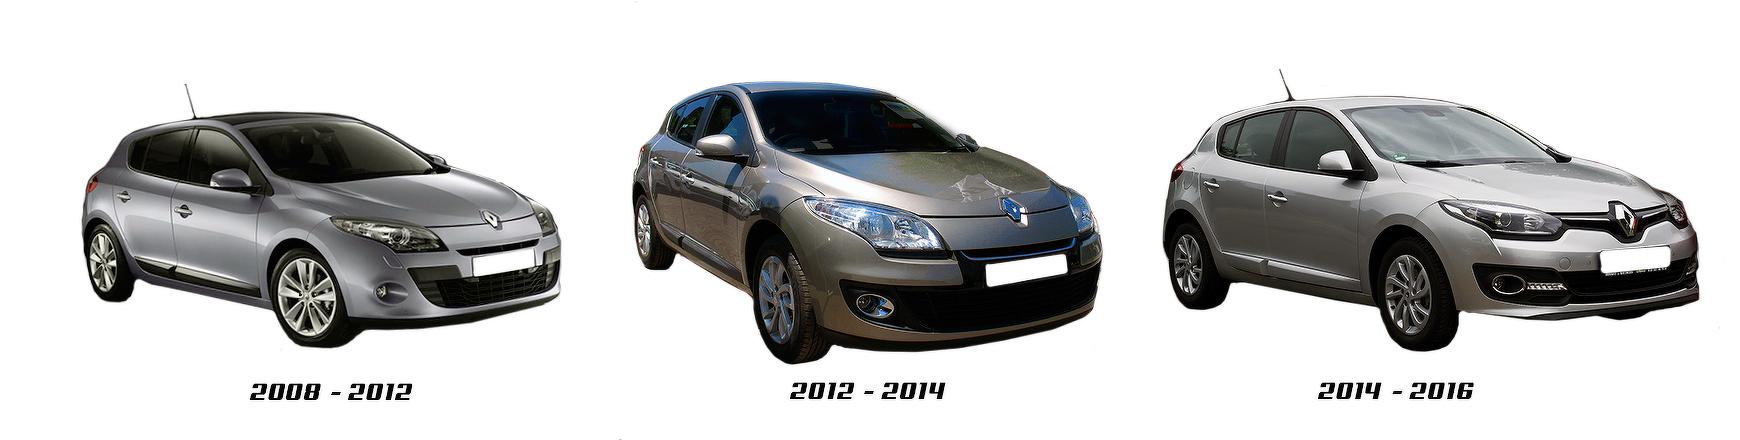 recambios para renault megane 2008 2009 2010 2011 2012